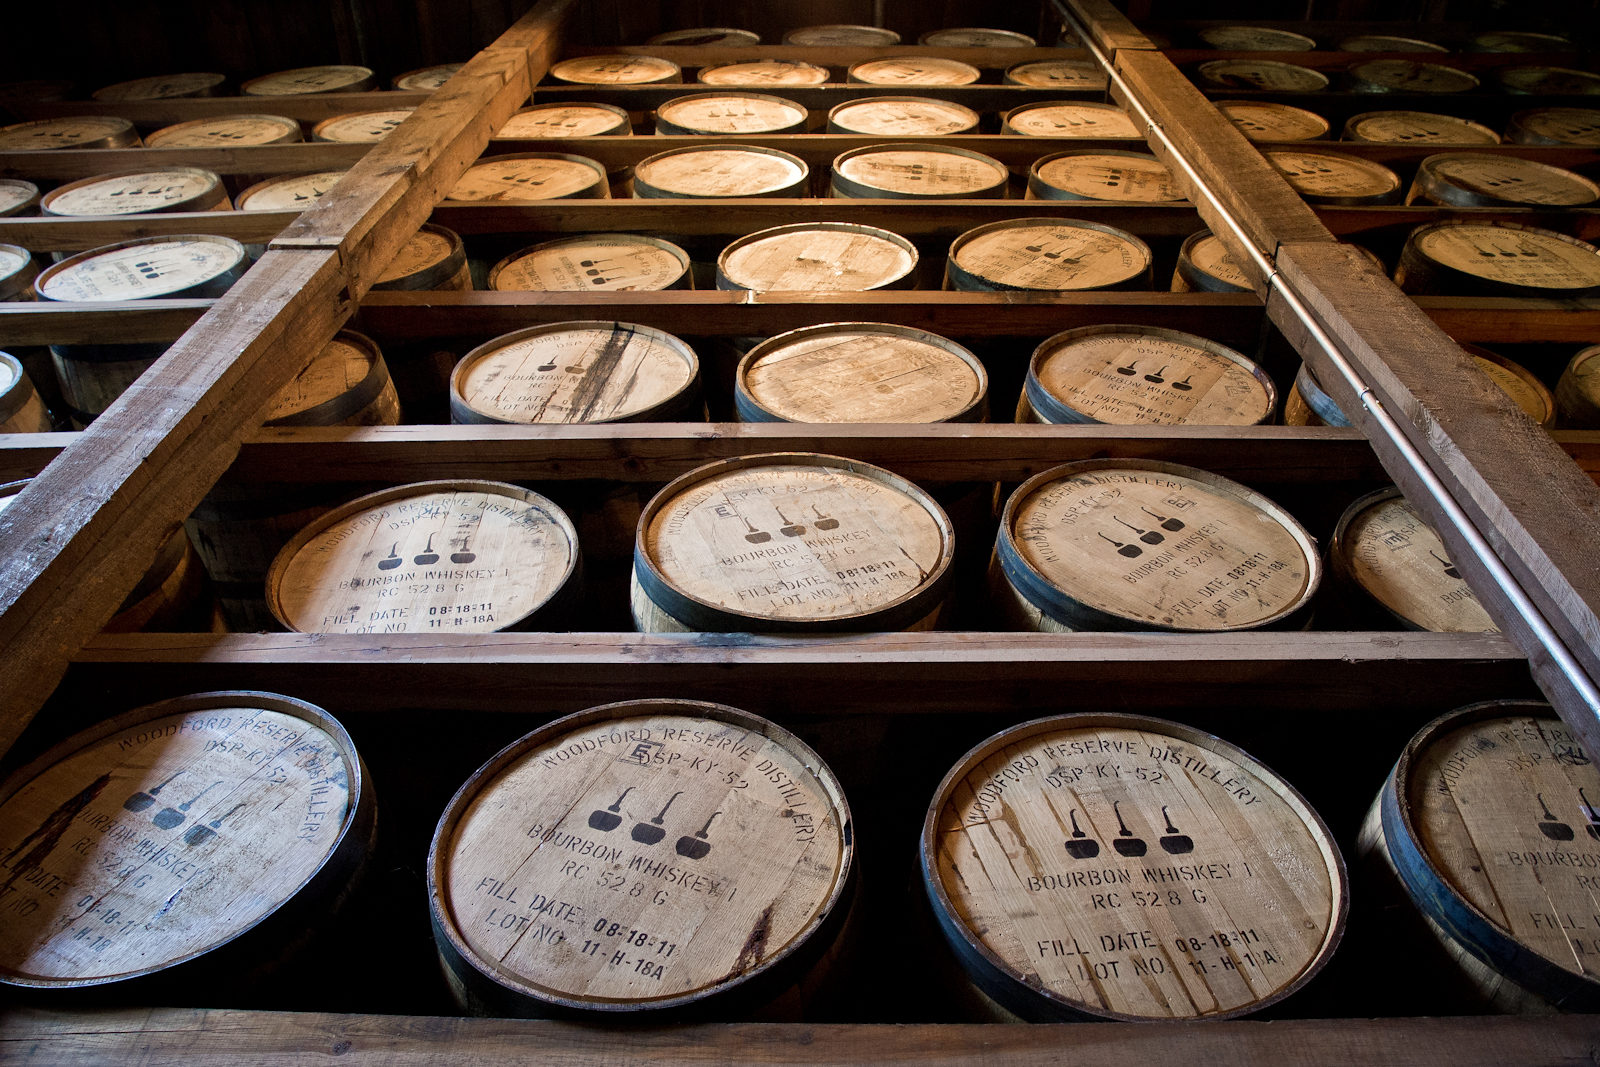 Woodford_Reserve_Distillery-27527-4_1557862611488.jpg